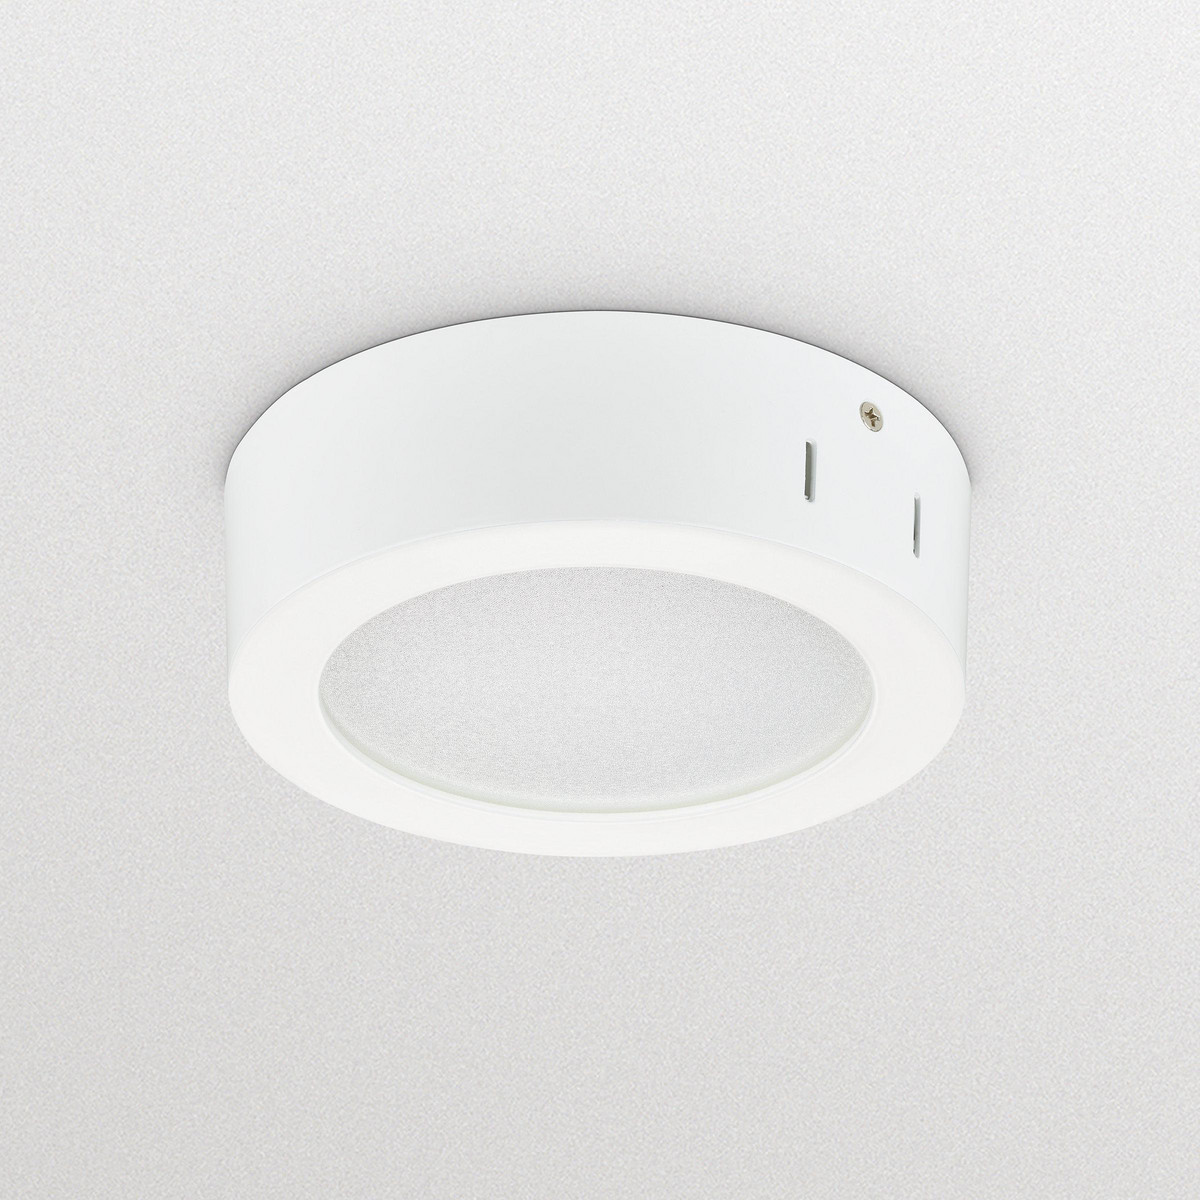 CoreLine SlimDownlight Gen3 Påbyg DN145C 1100lm/830 11W Hvid